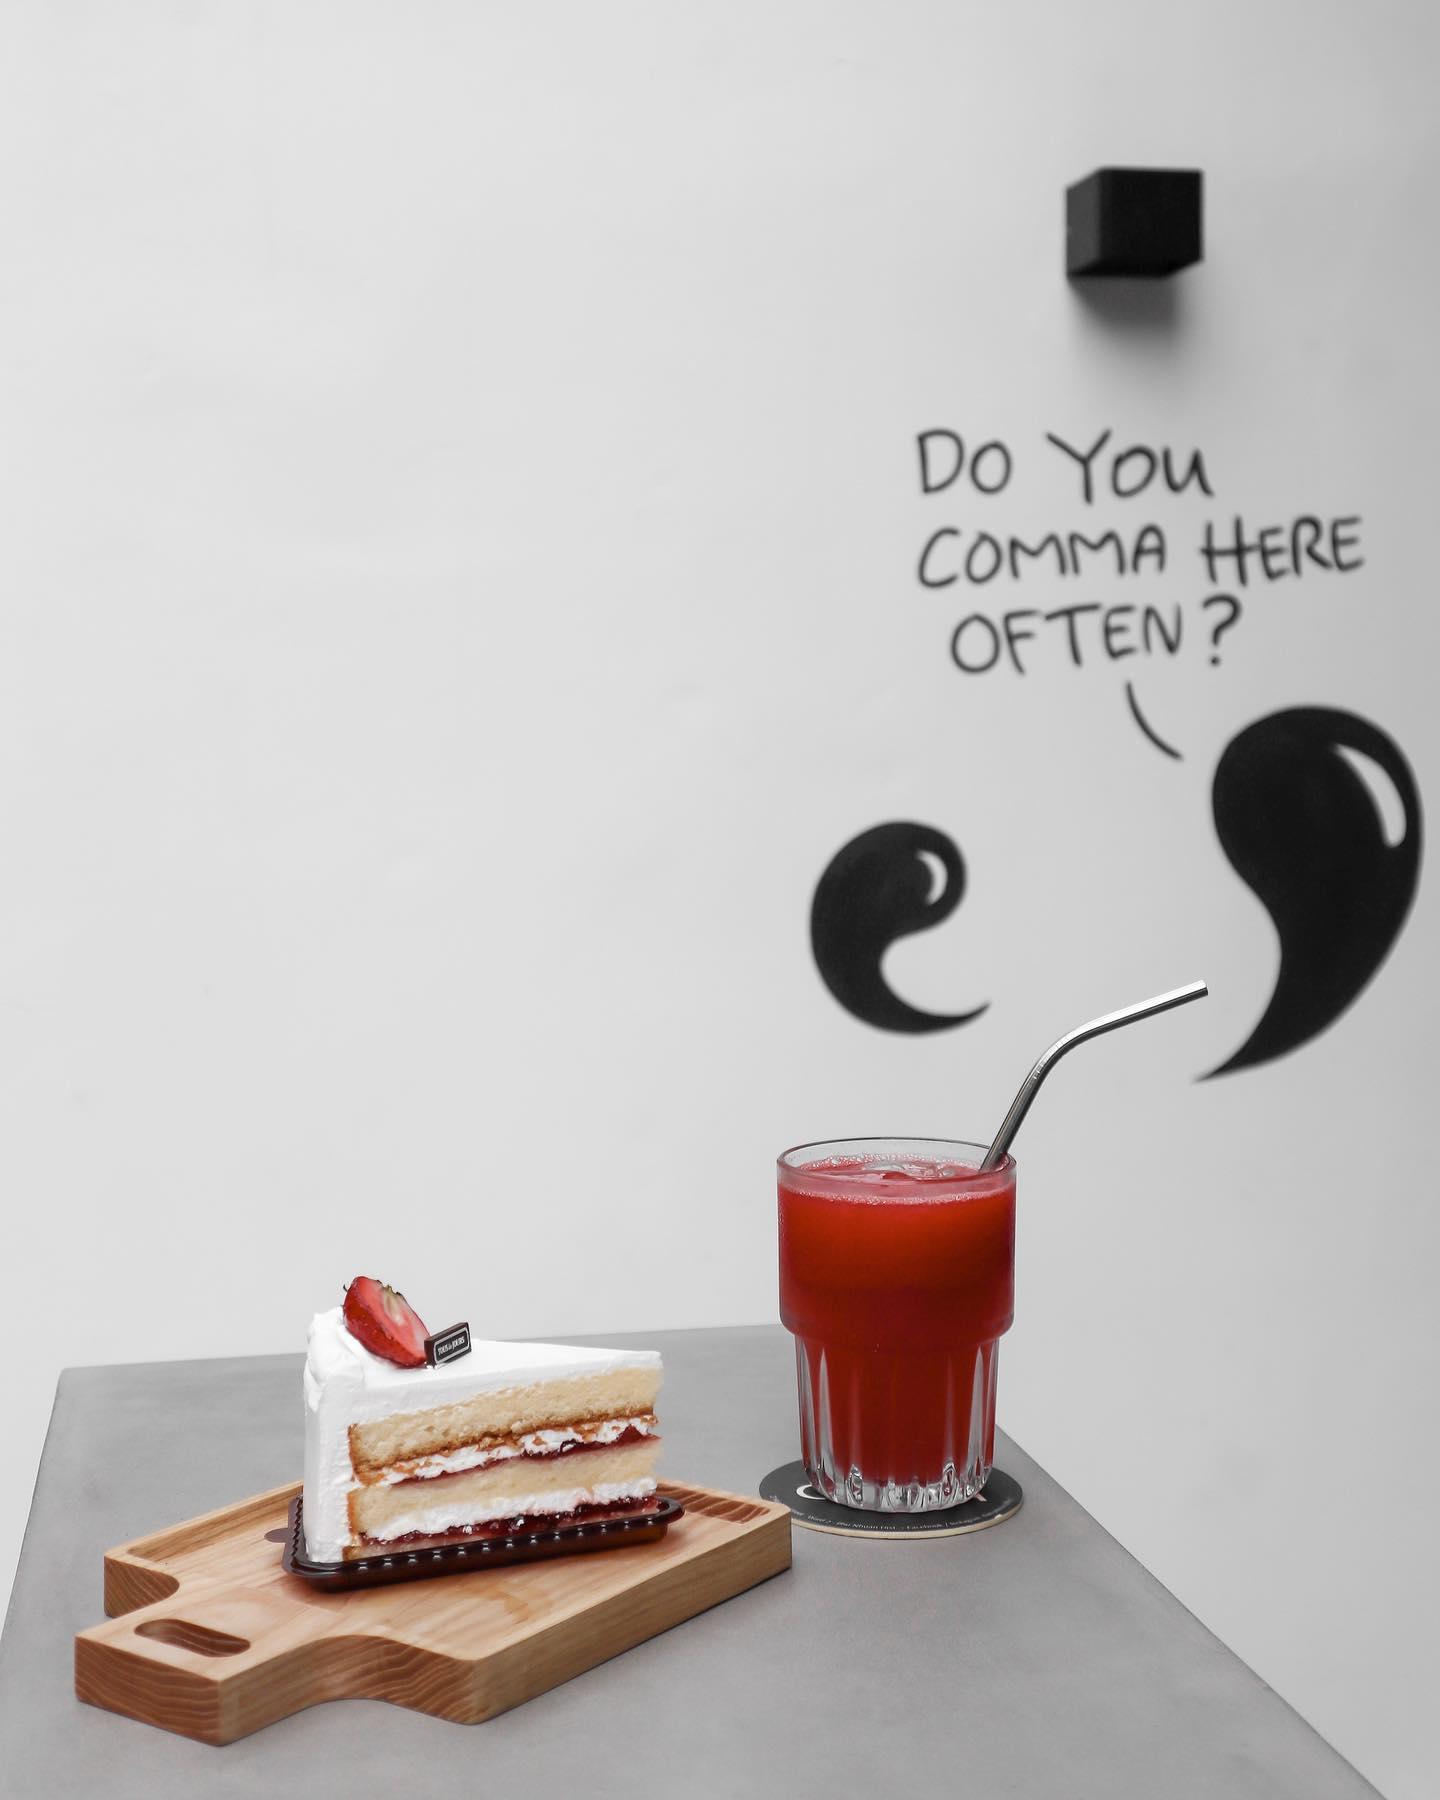 sai-gon-cafe-the-comma-coffee-8